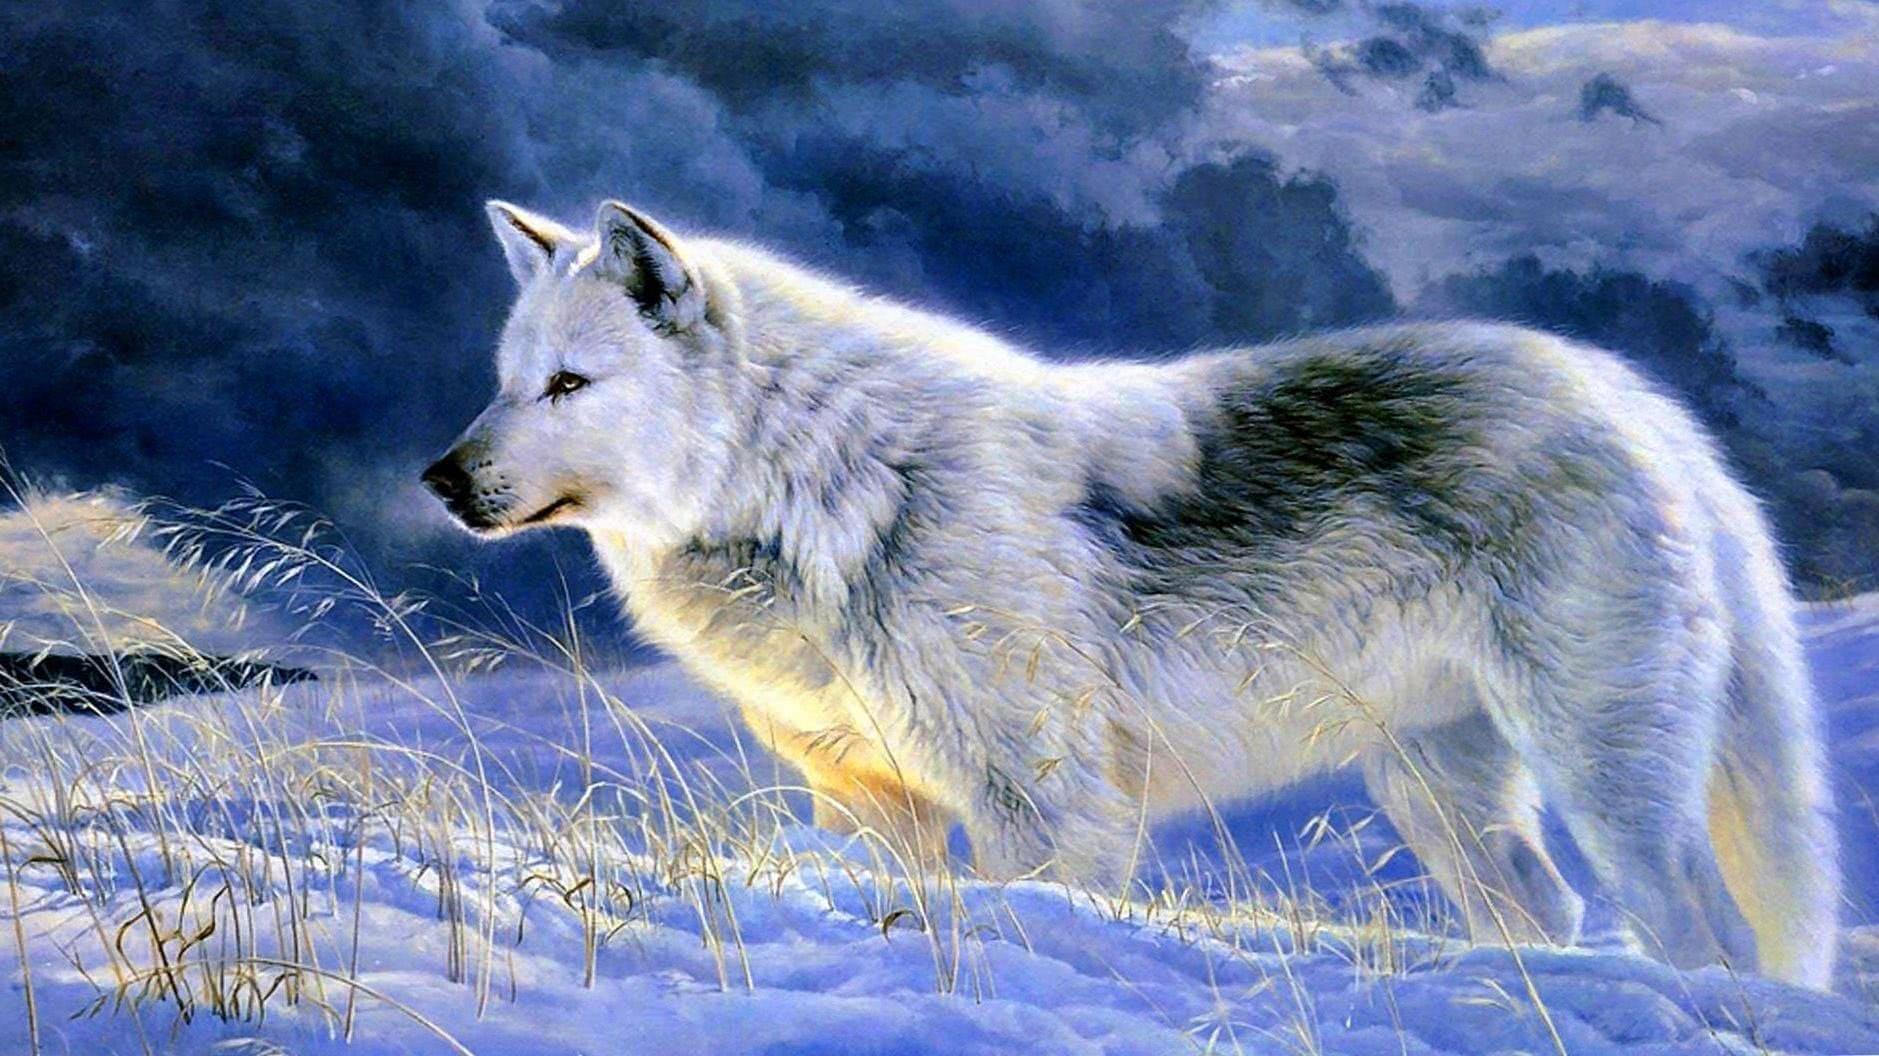 Wolf Wild Animal Wallpaper